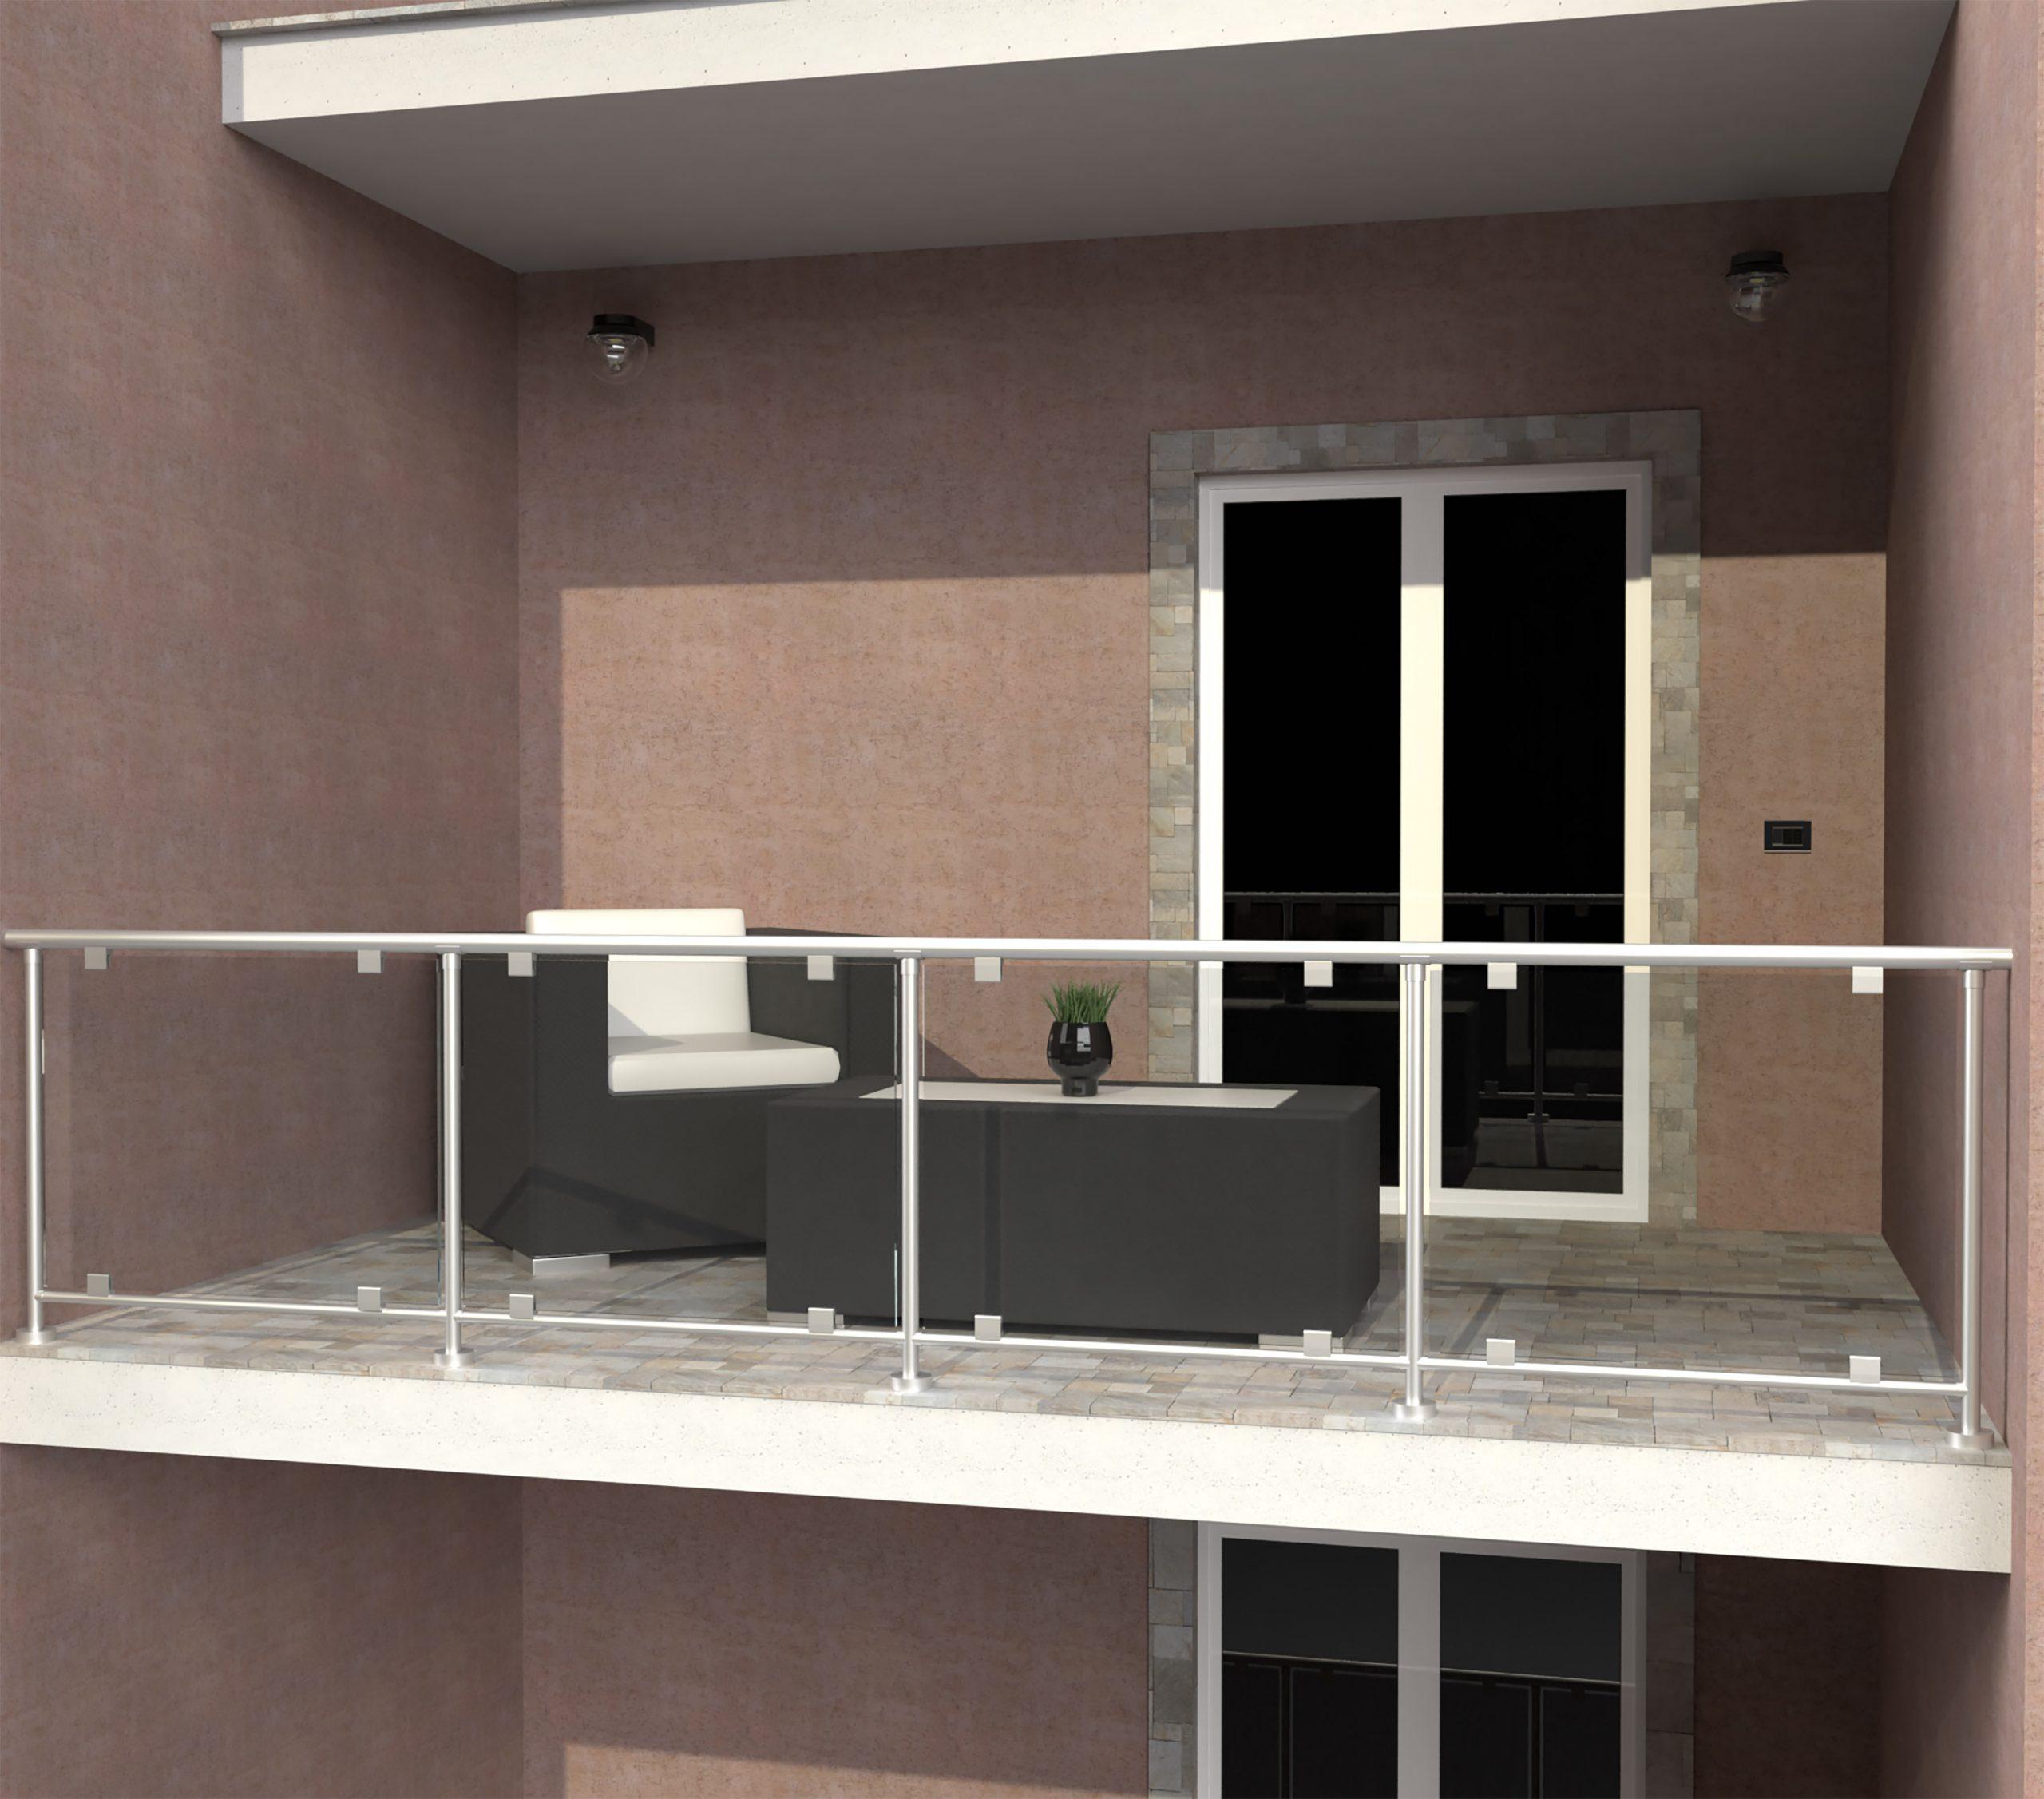 https://www.allpaint.it/wp-content/uploads/2021/09/ringhiere-tondo-glass-allpaint-scaled.jpg